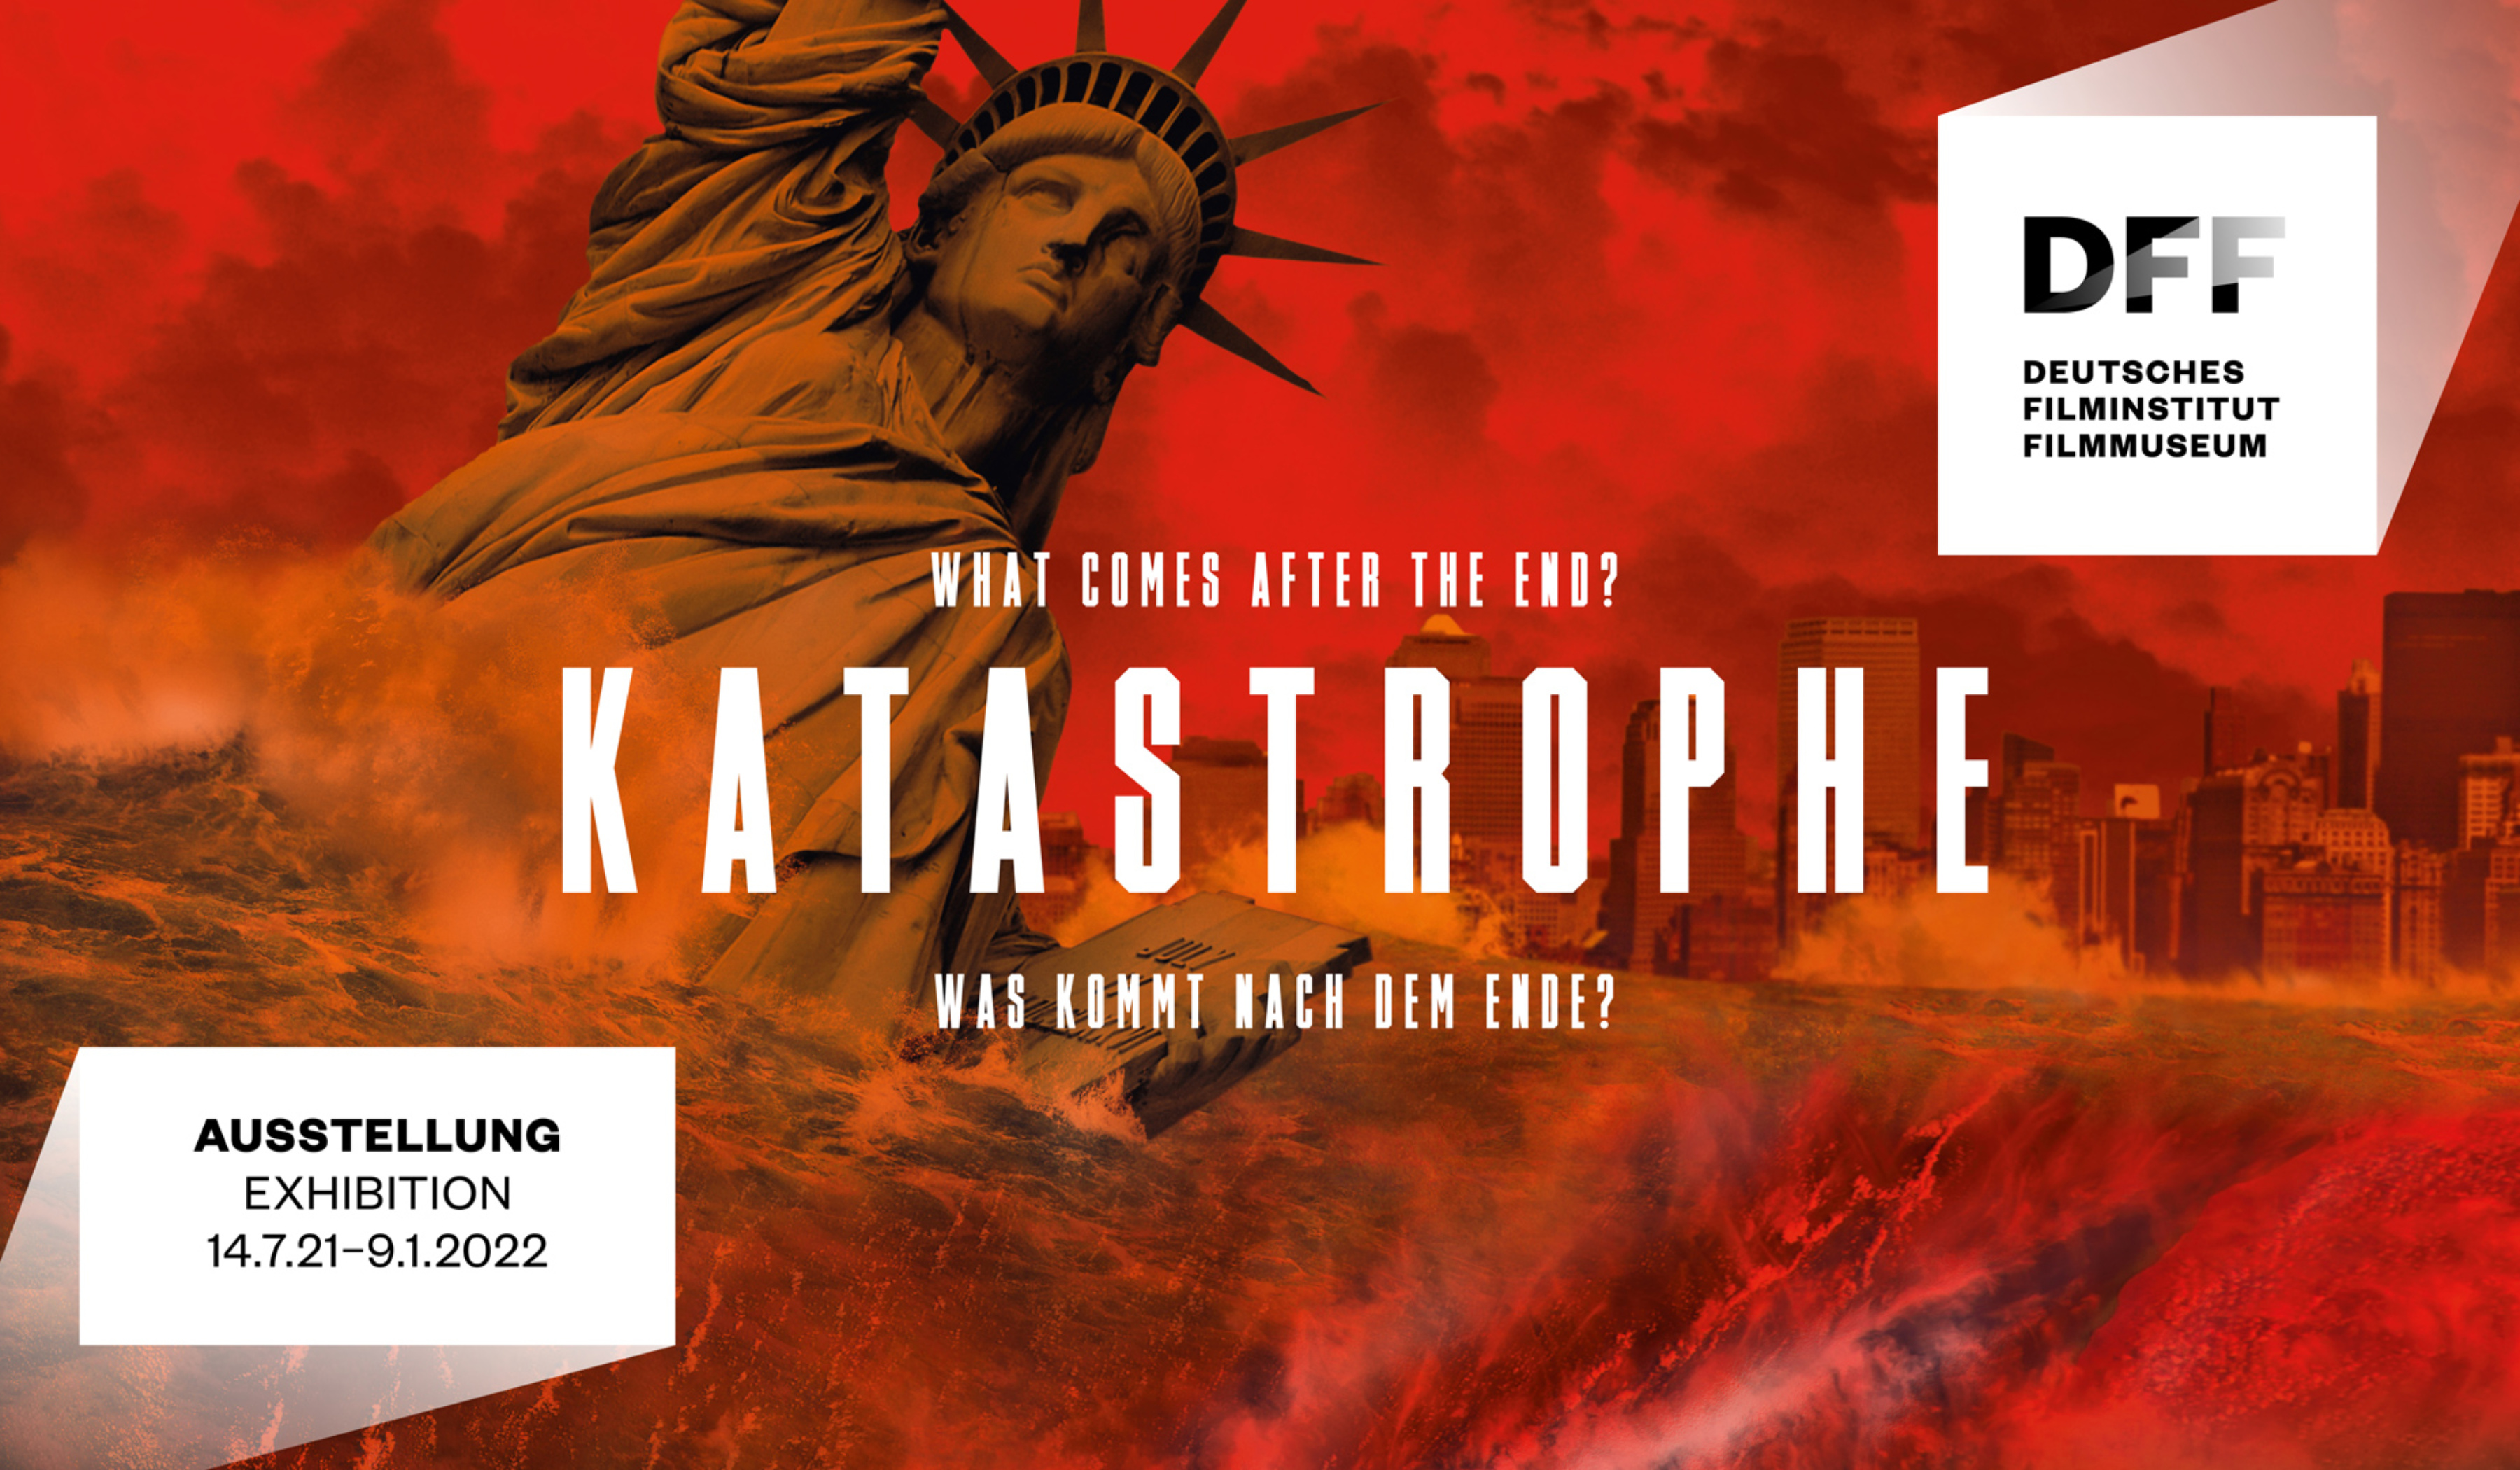 katastrophe-dff